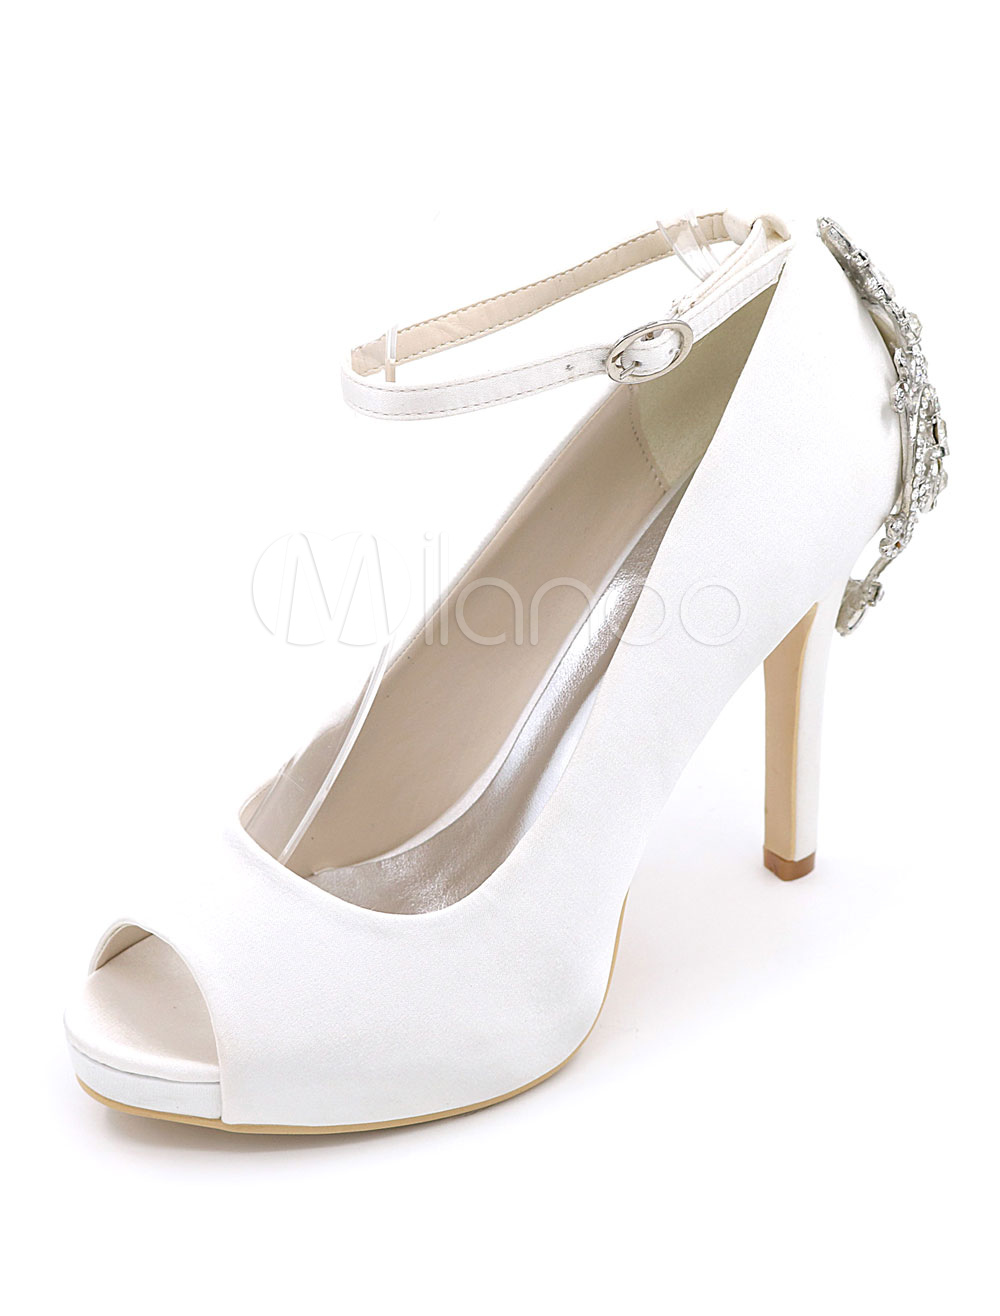 White Wedding Shoes Satin High Heel Women's Peep Toe Rhinestones Ankle Strap Pumps